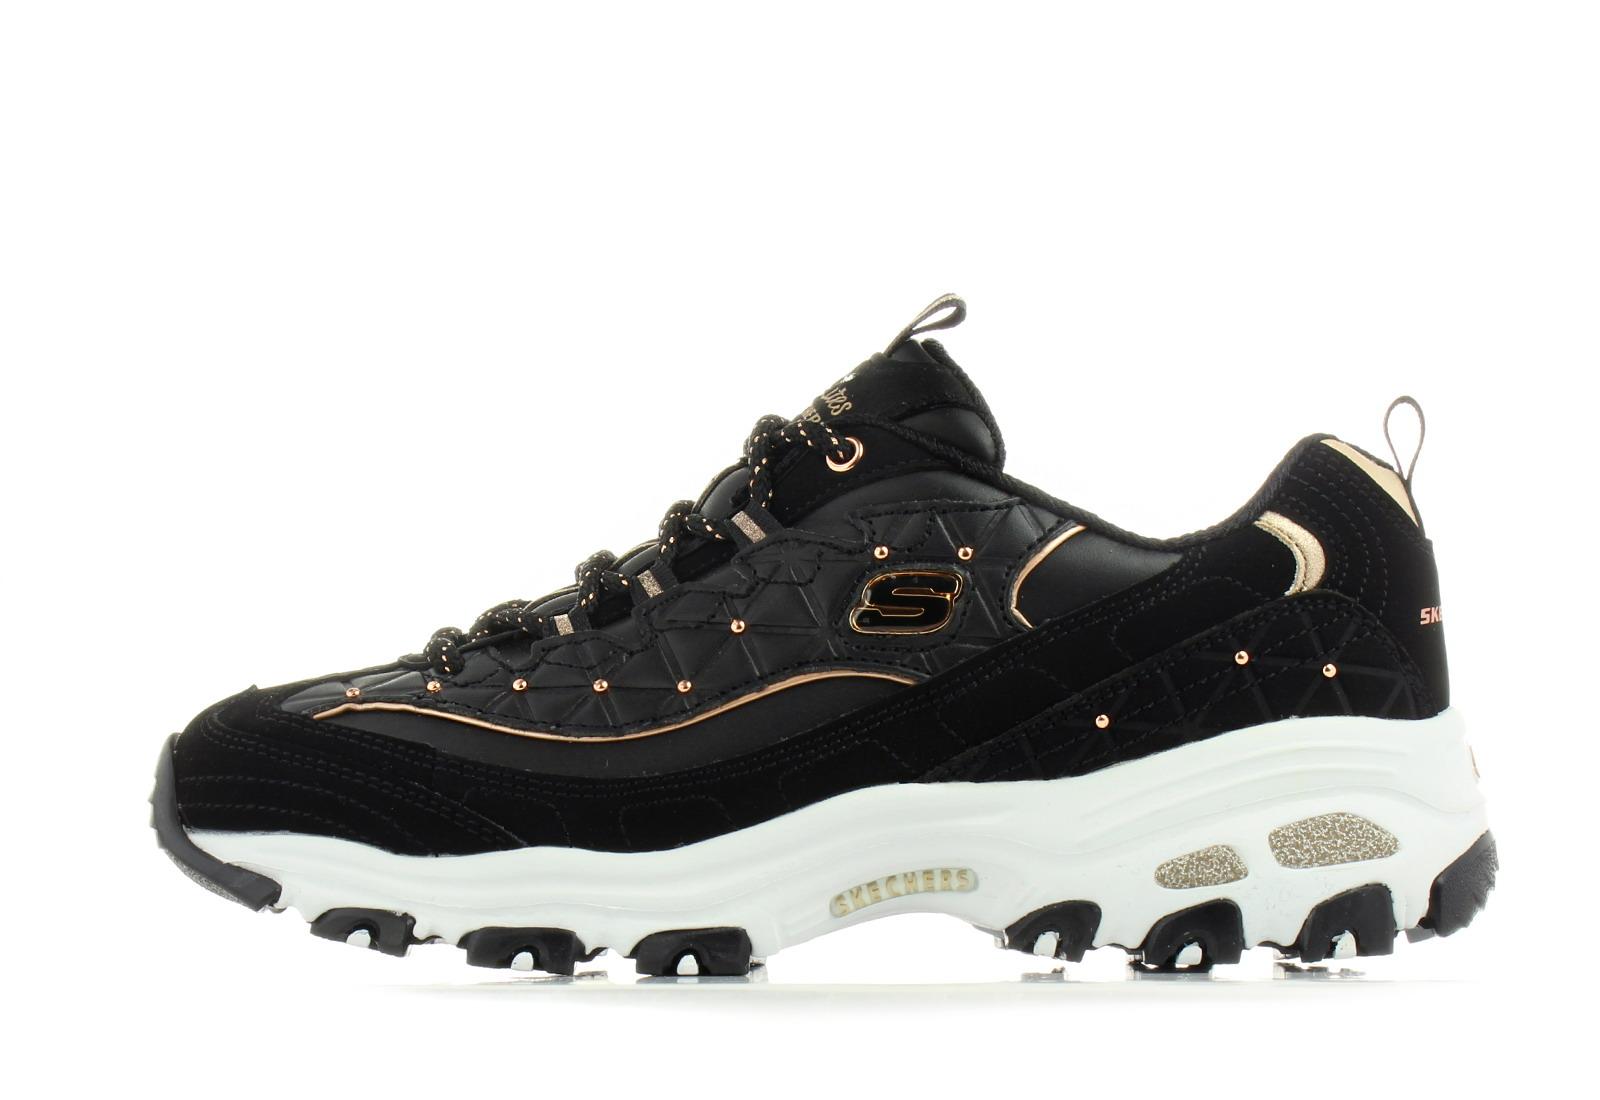 334e4c8c4c39 Skechers Cipő - D Lites - Glamour Feels - 13087-bkrg - Office Shoes ...